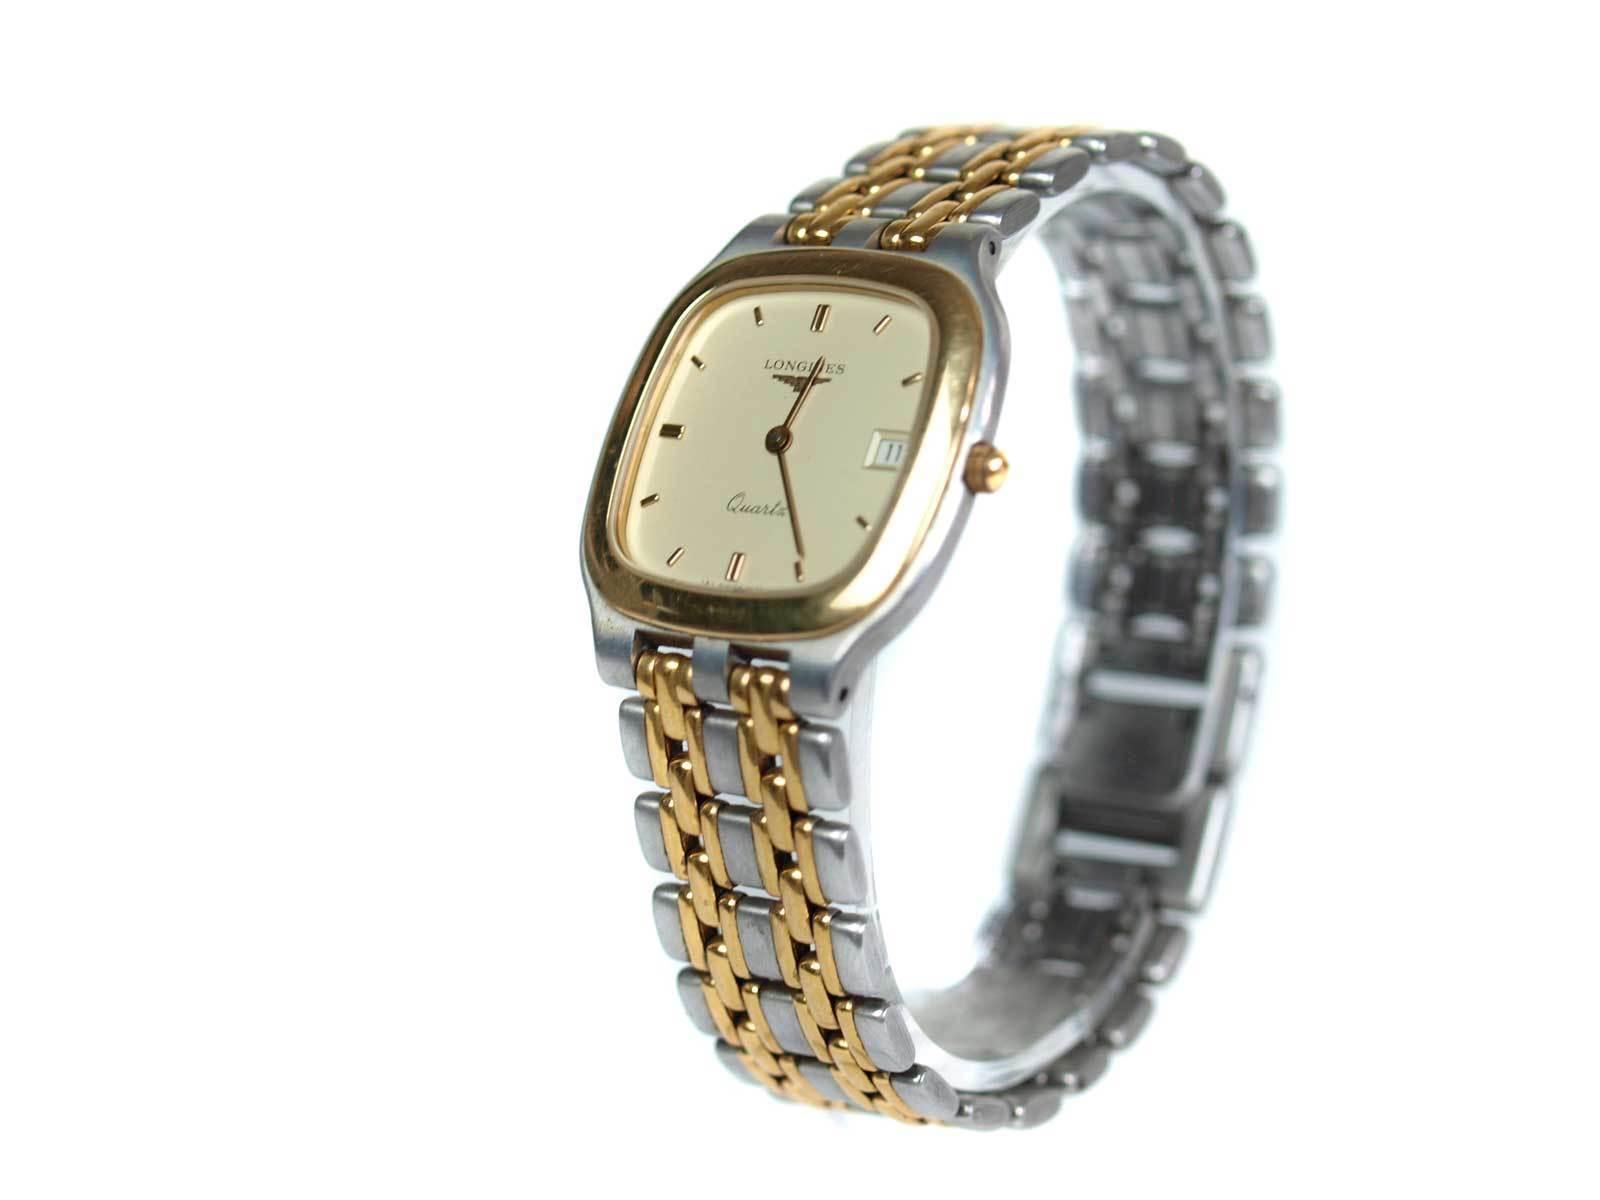 Auth LONGINES Date Stainless Steel Quartz Watch Unisex LW16619L  - $219.00